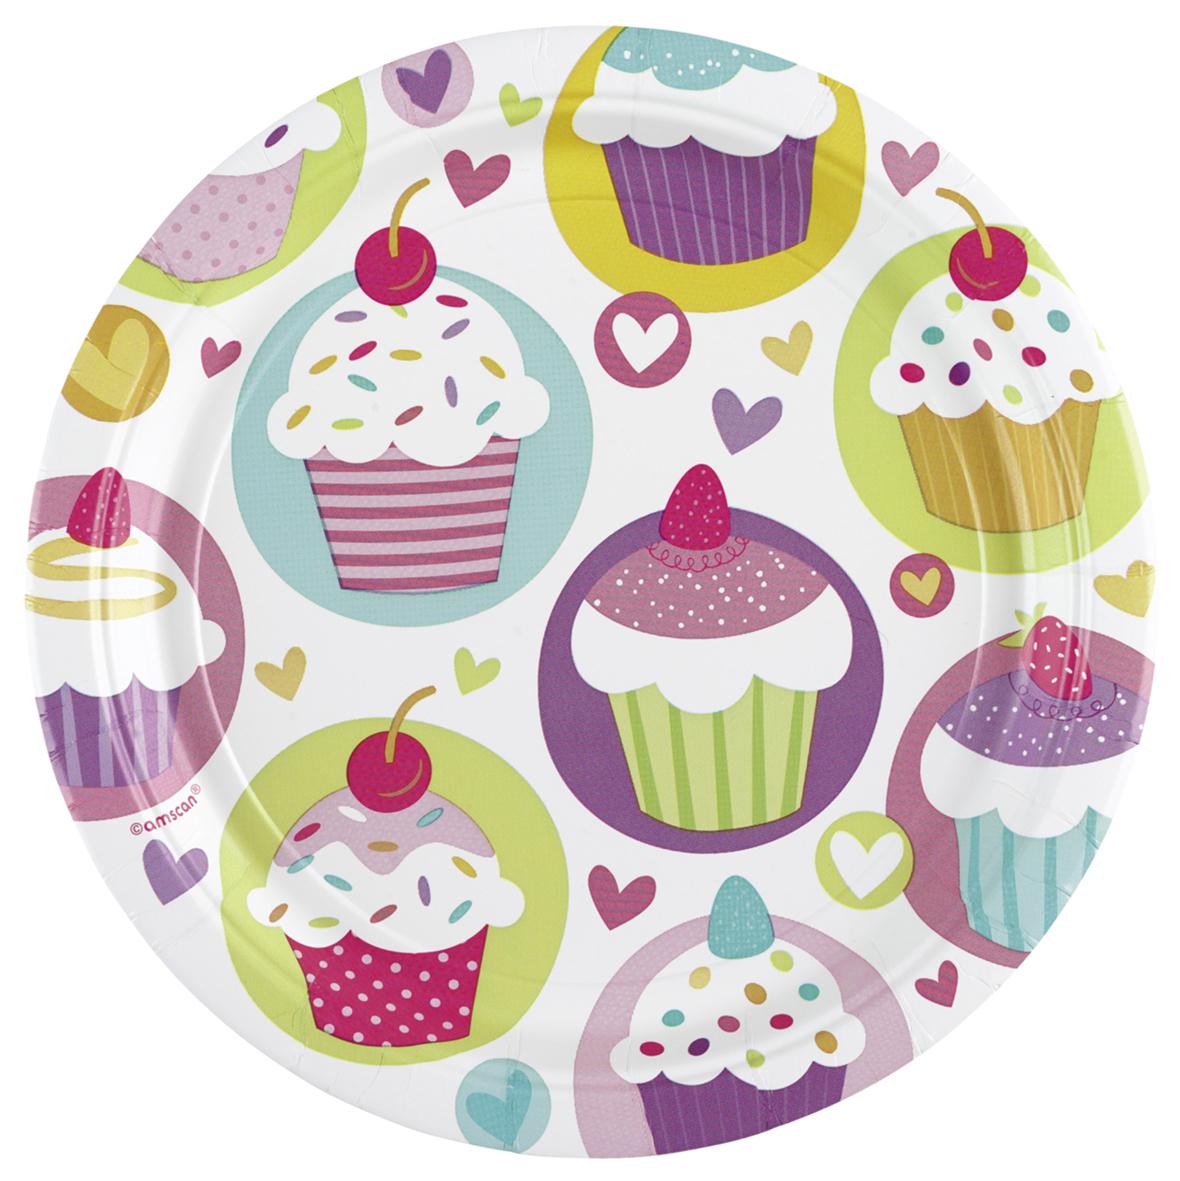 // Cupcake Party 8 Teller klein 997210 !!!